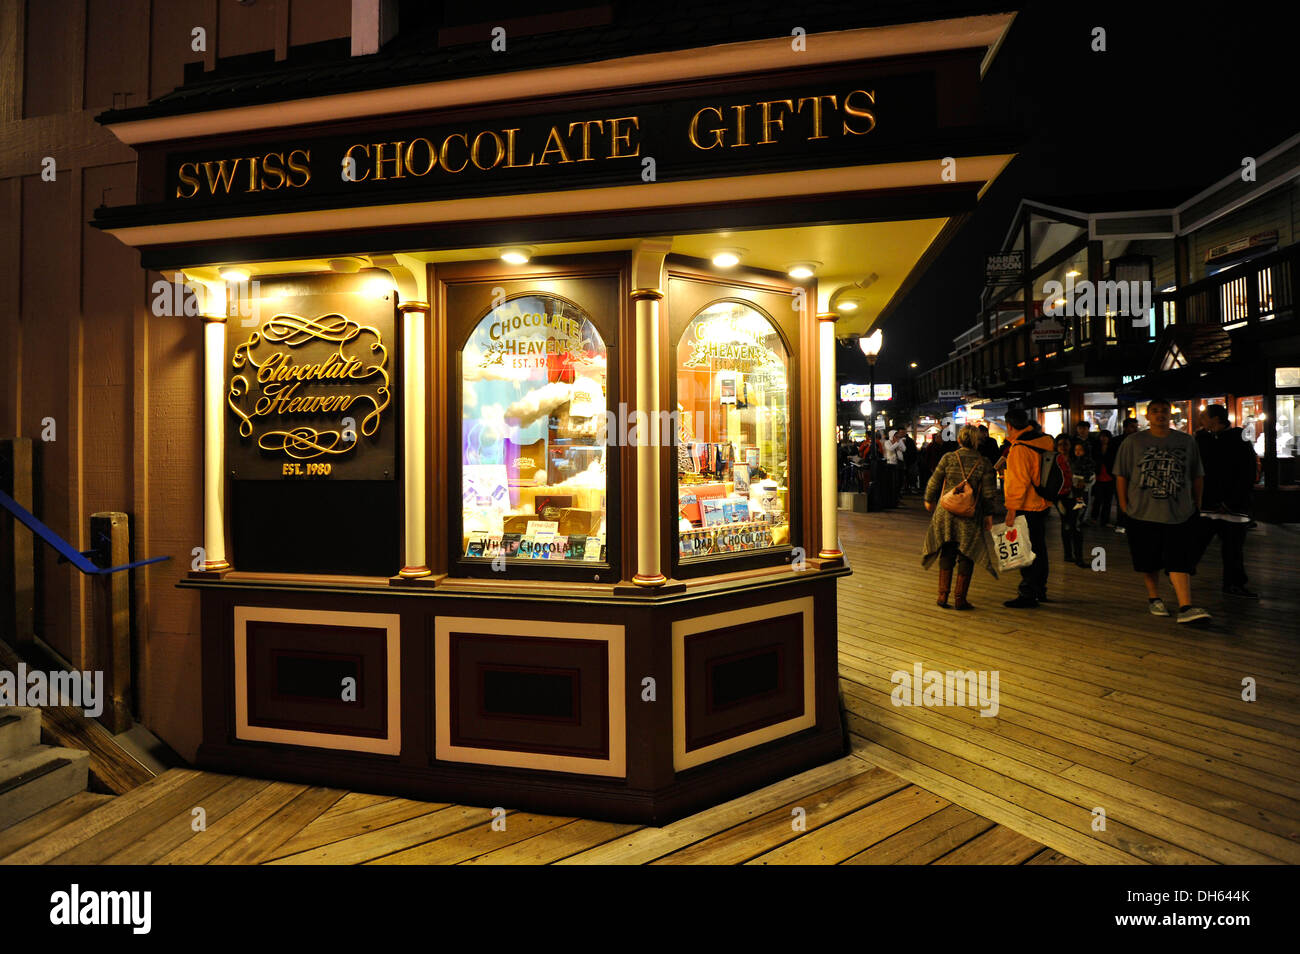 Chocolate Shop Windows Stock Photos & Chocolate Shop Windows Stock ...